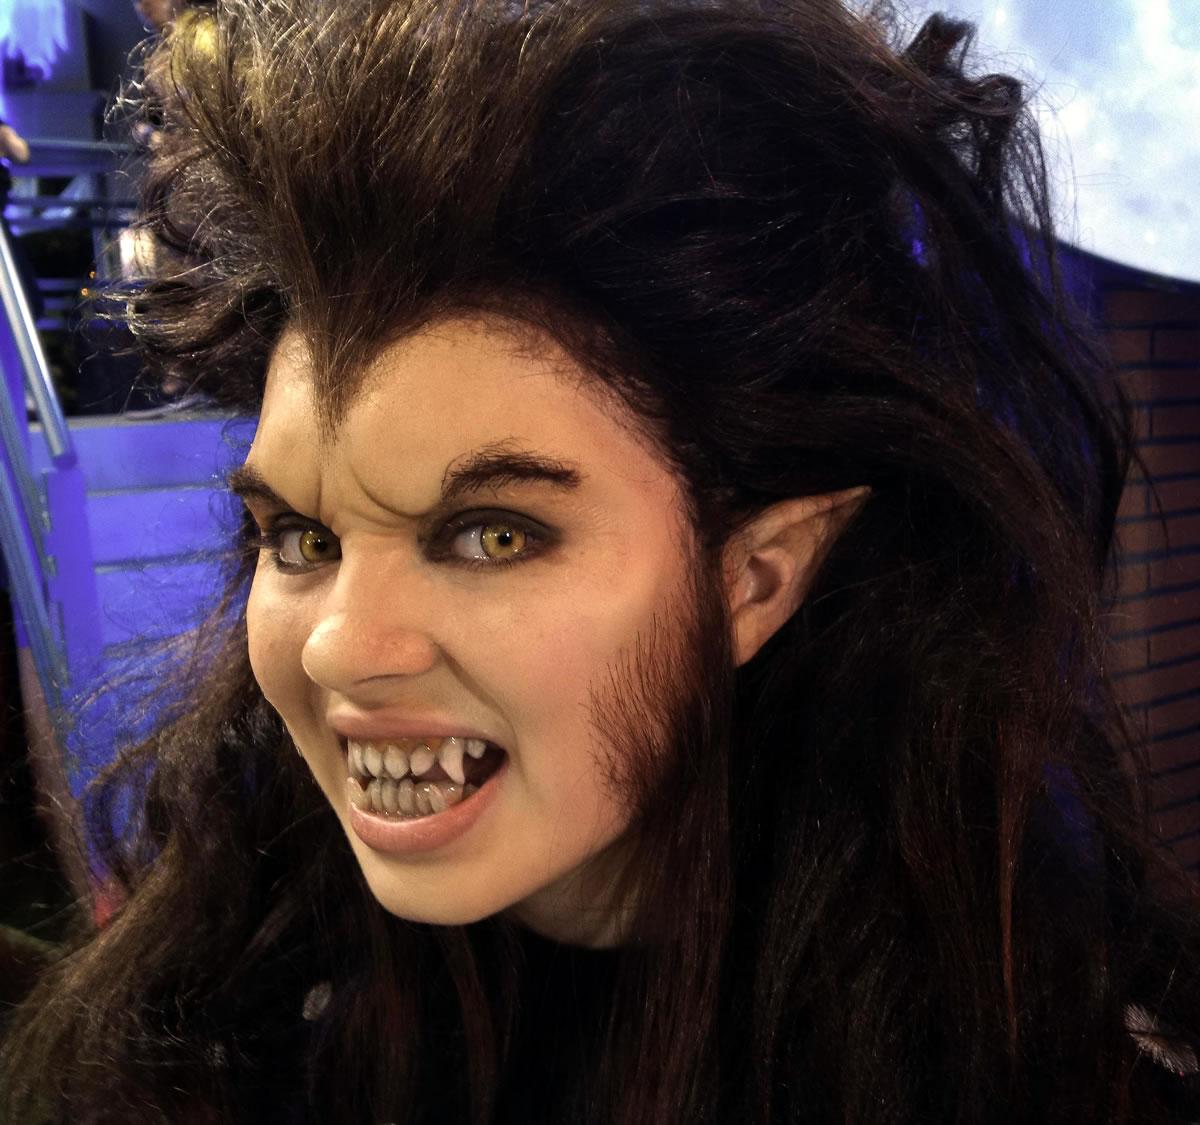 Werewolf girl from Disney's 'Best Friends Whenever'